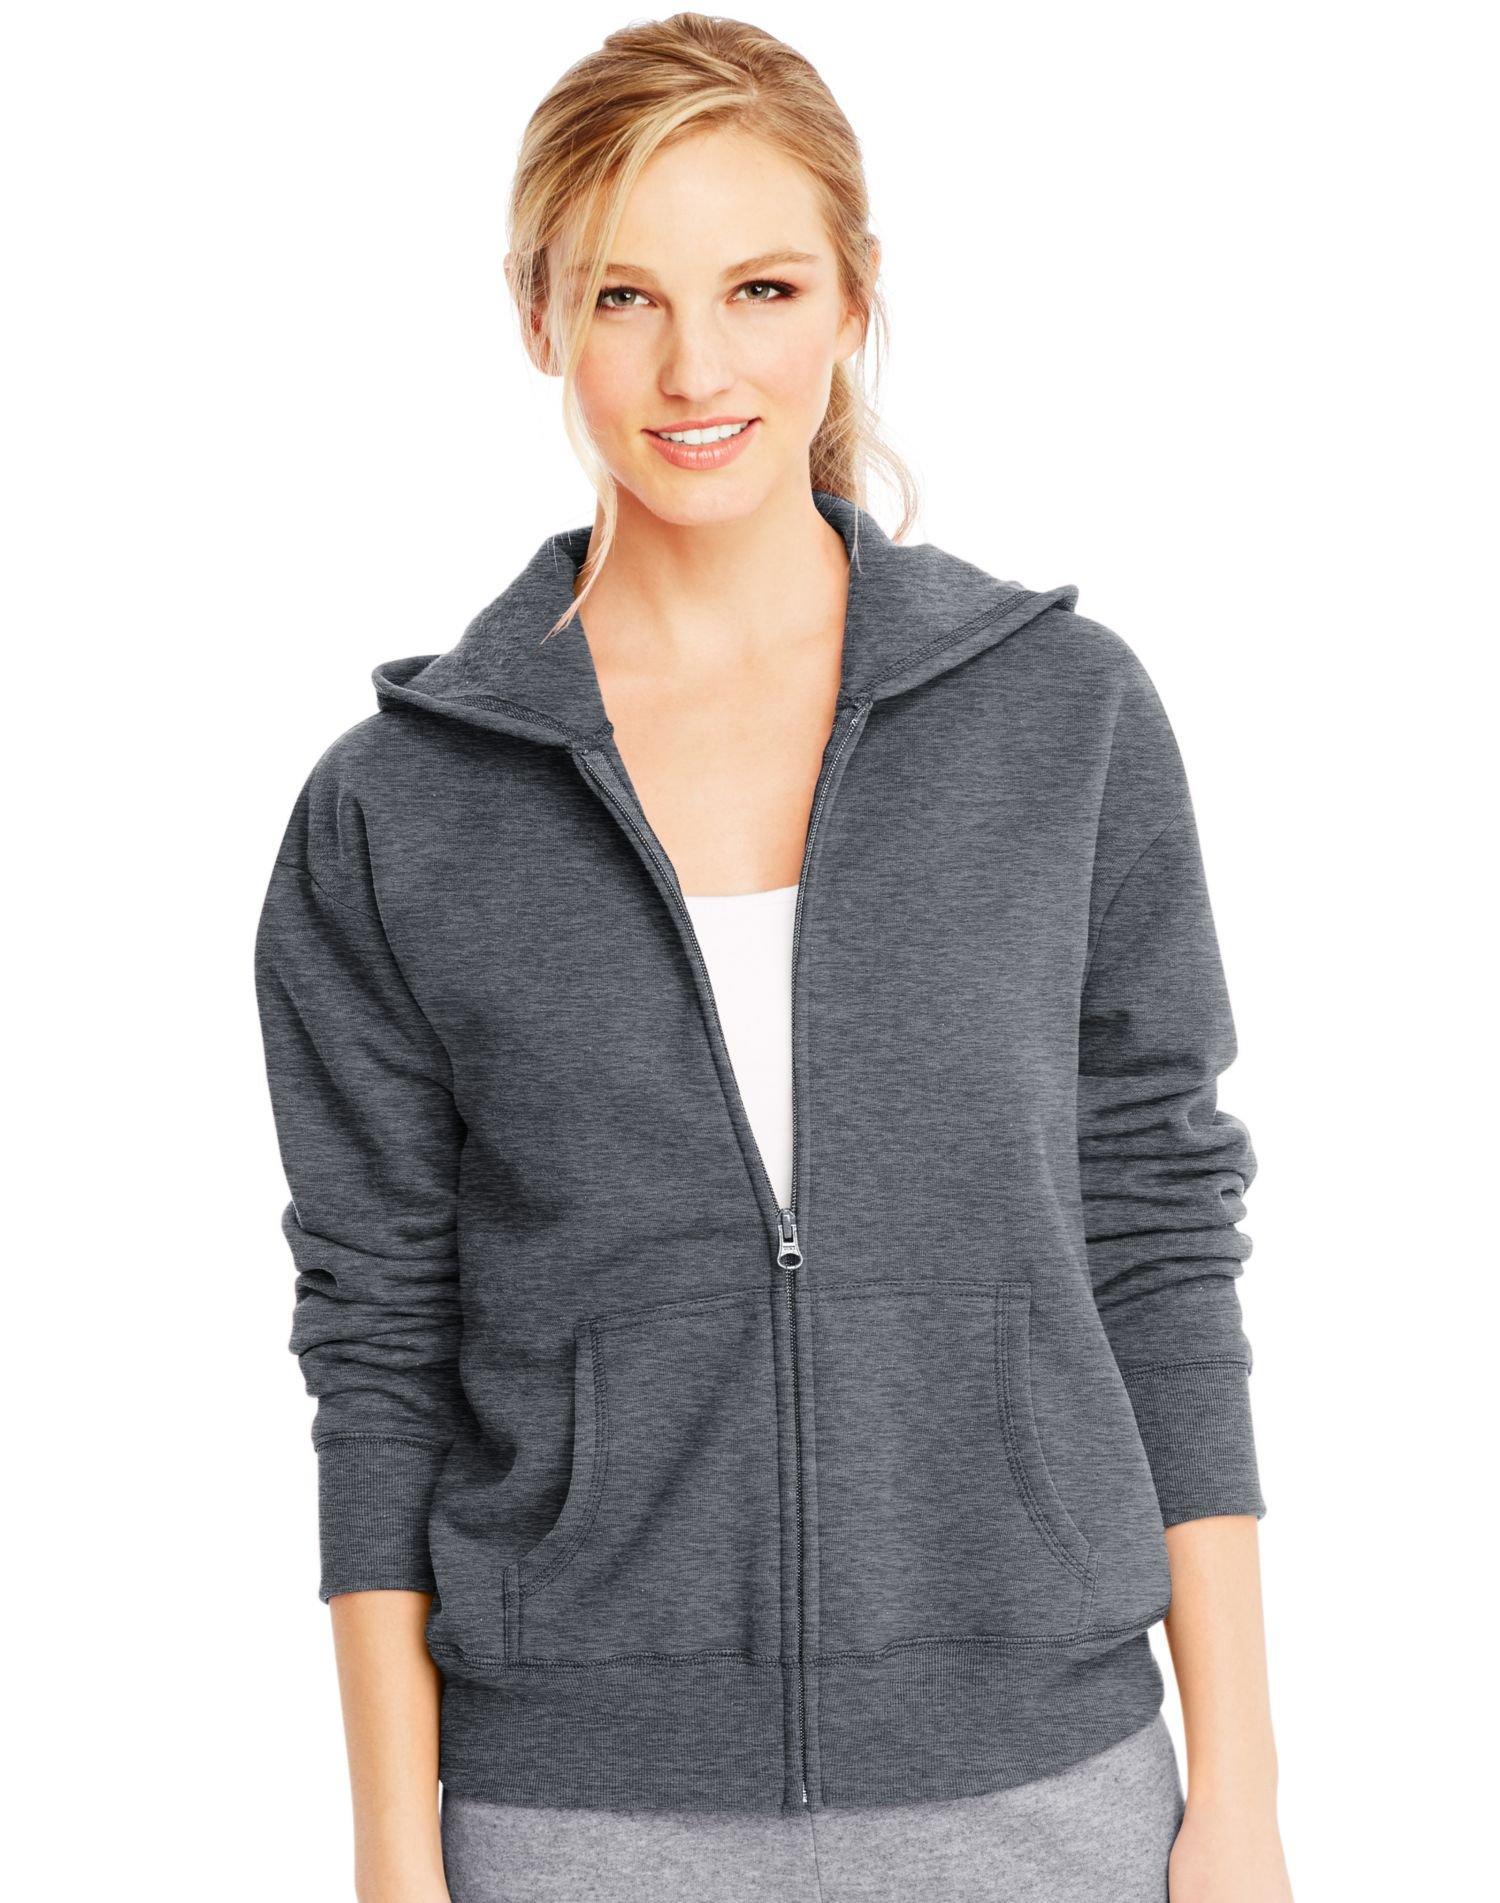 Hanes Women's Full-Zip Hooded Jacket, Slate Heather, x Large